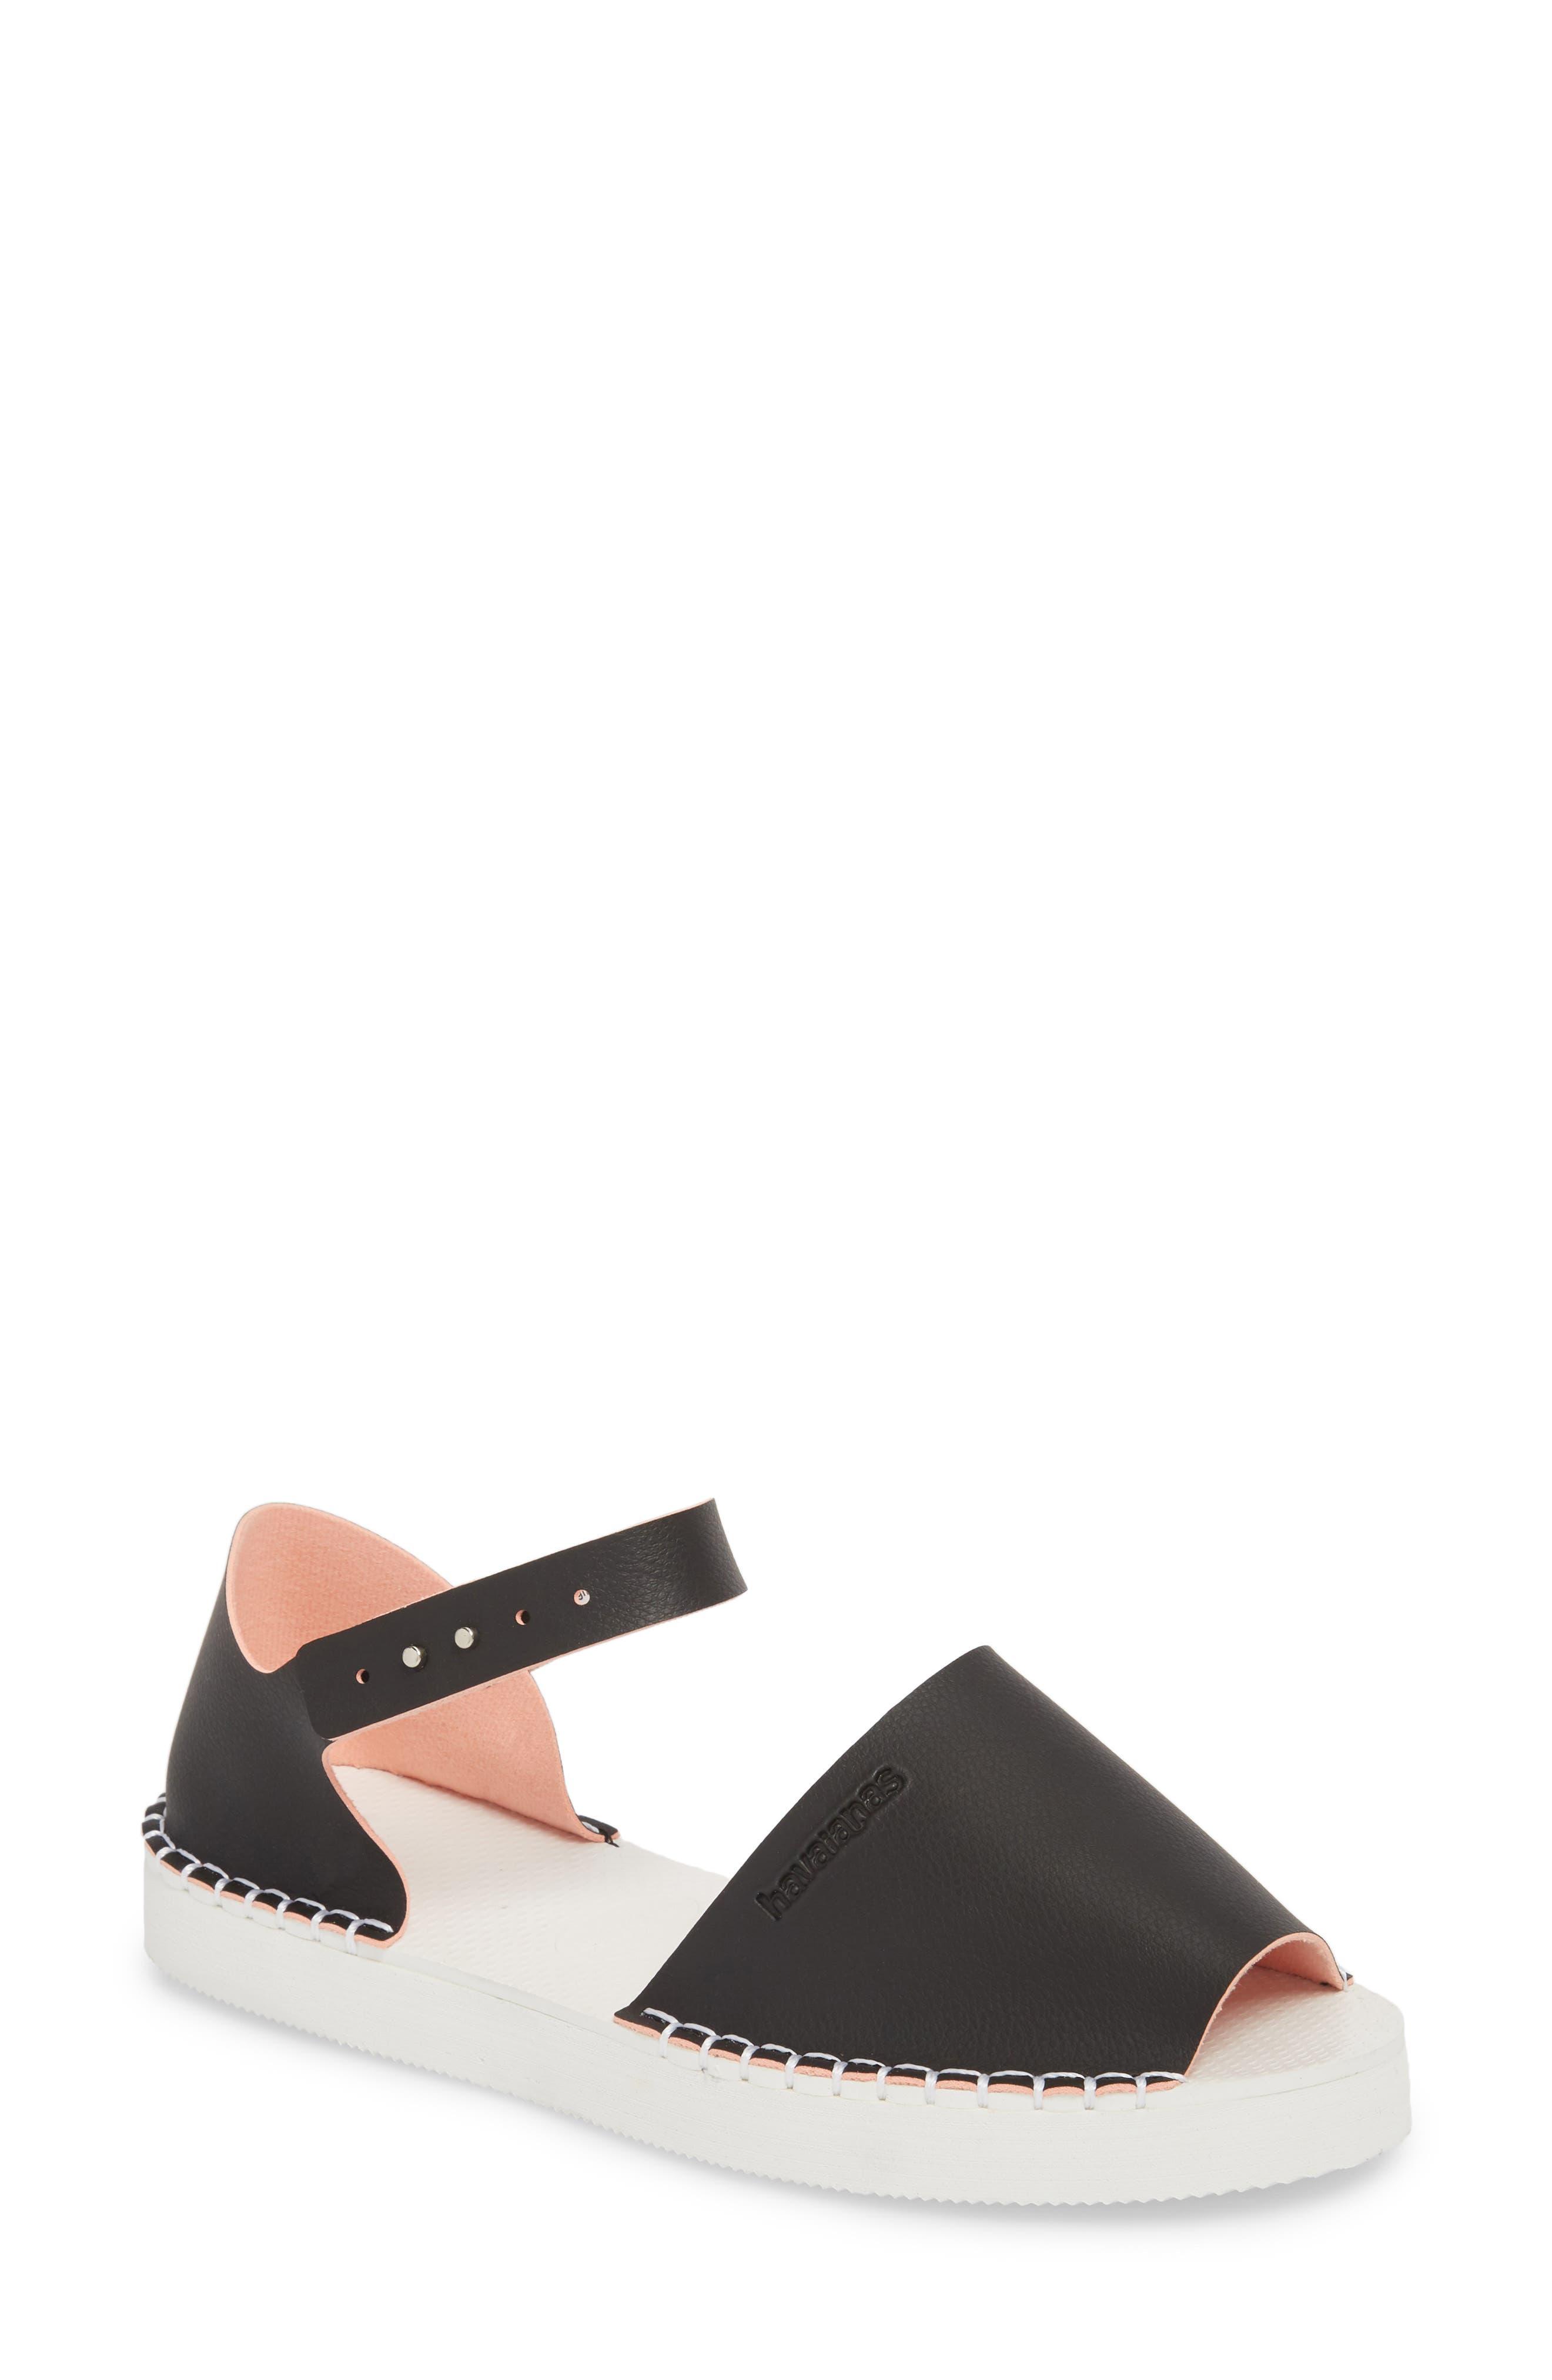 Flatform Fashion Sandal,                             Main thumbnail 1, color,                             BLACK/ PINK